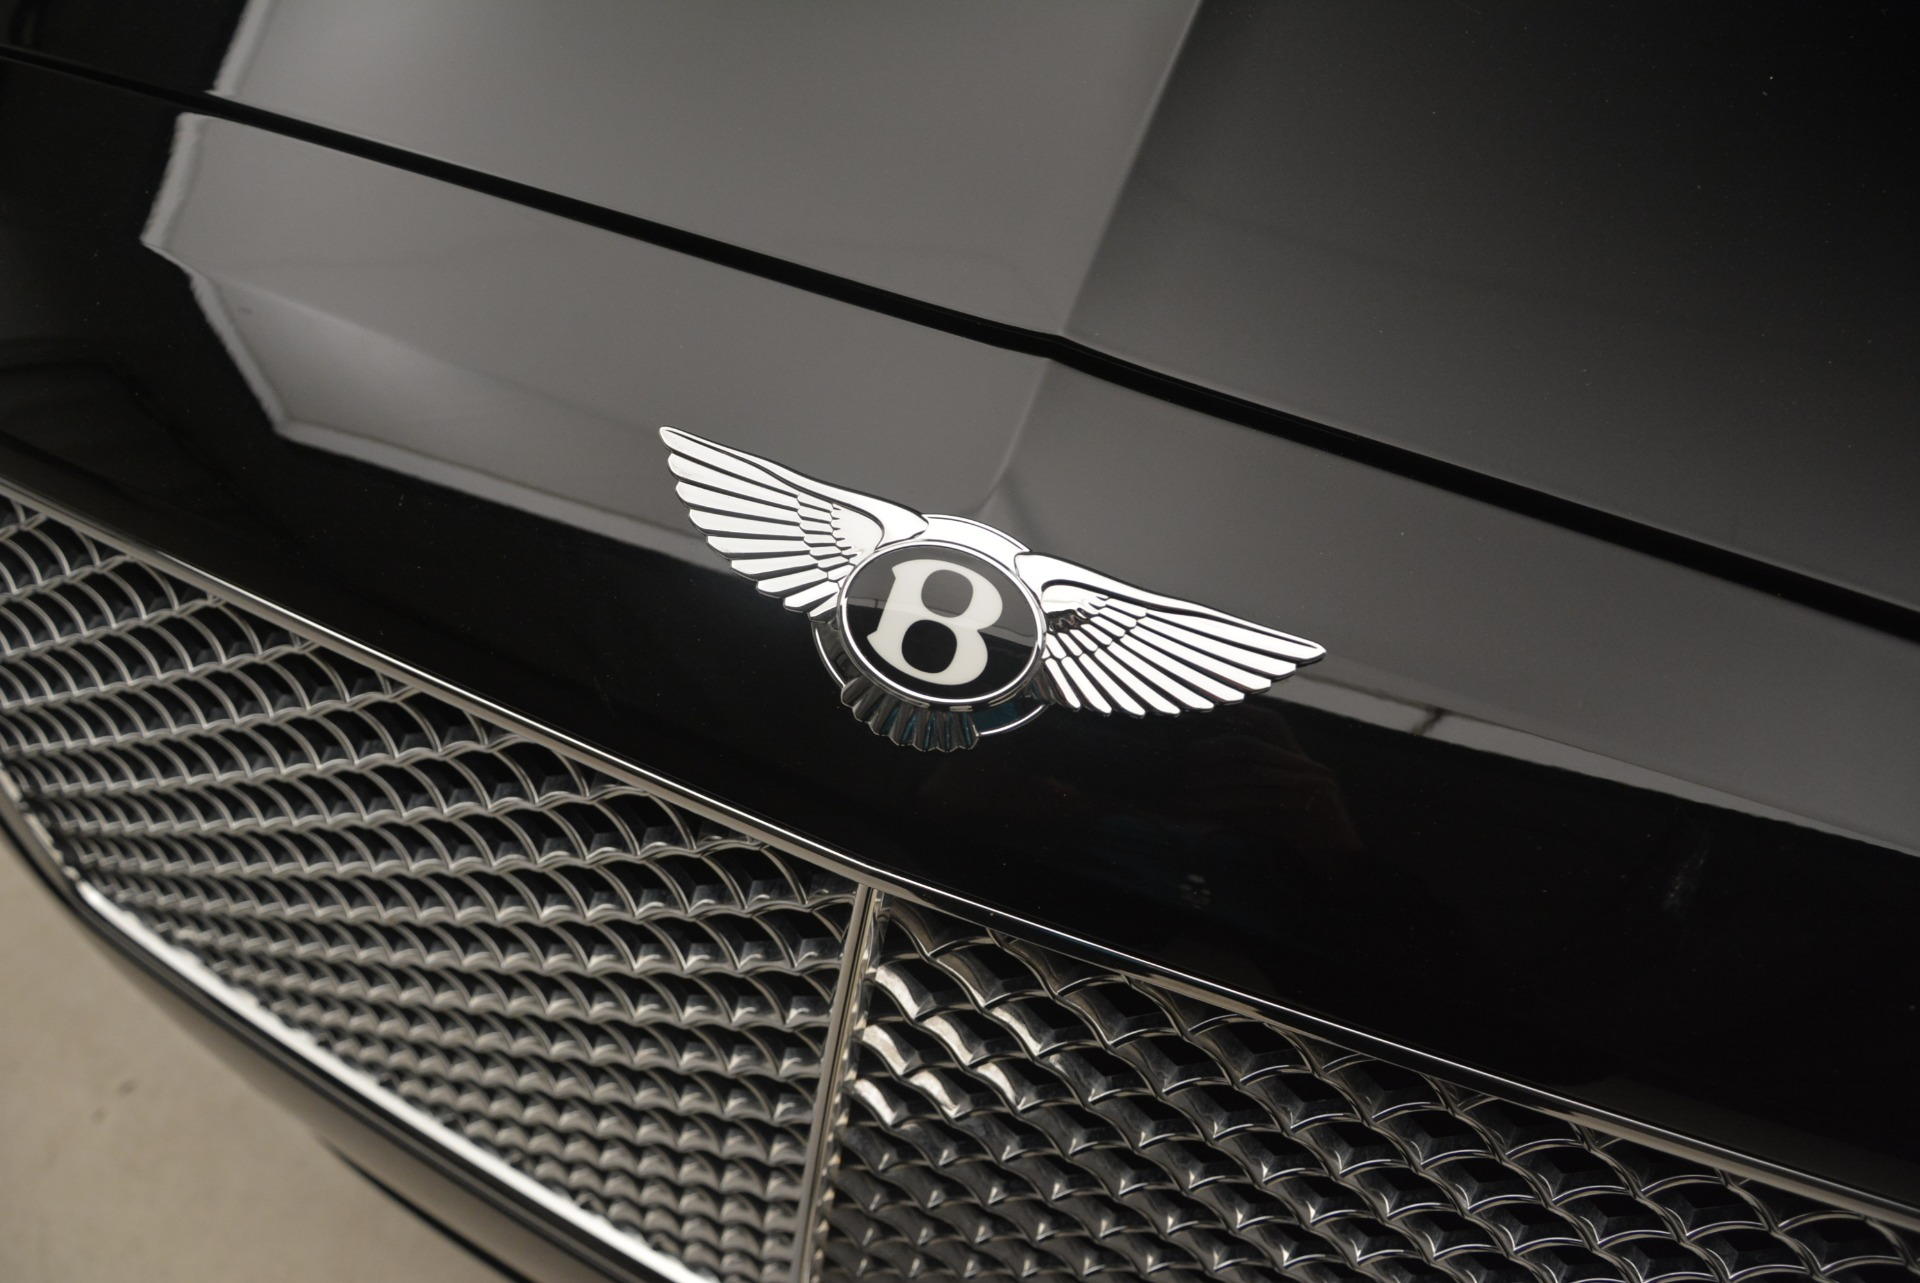 Used 2014 Bentley Flying Spur W12 For Sale In Westport, CT 2267_p14